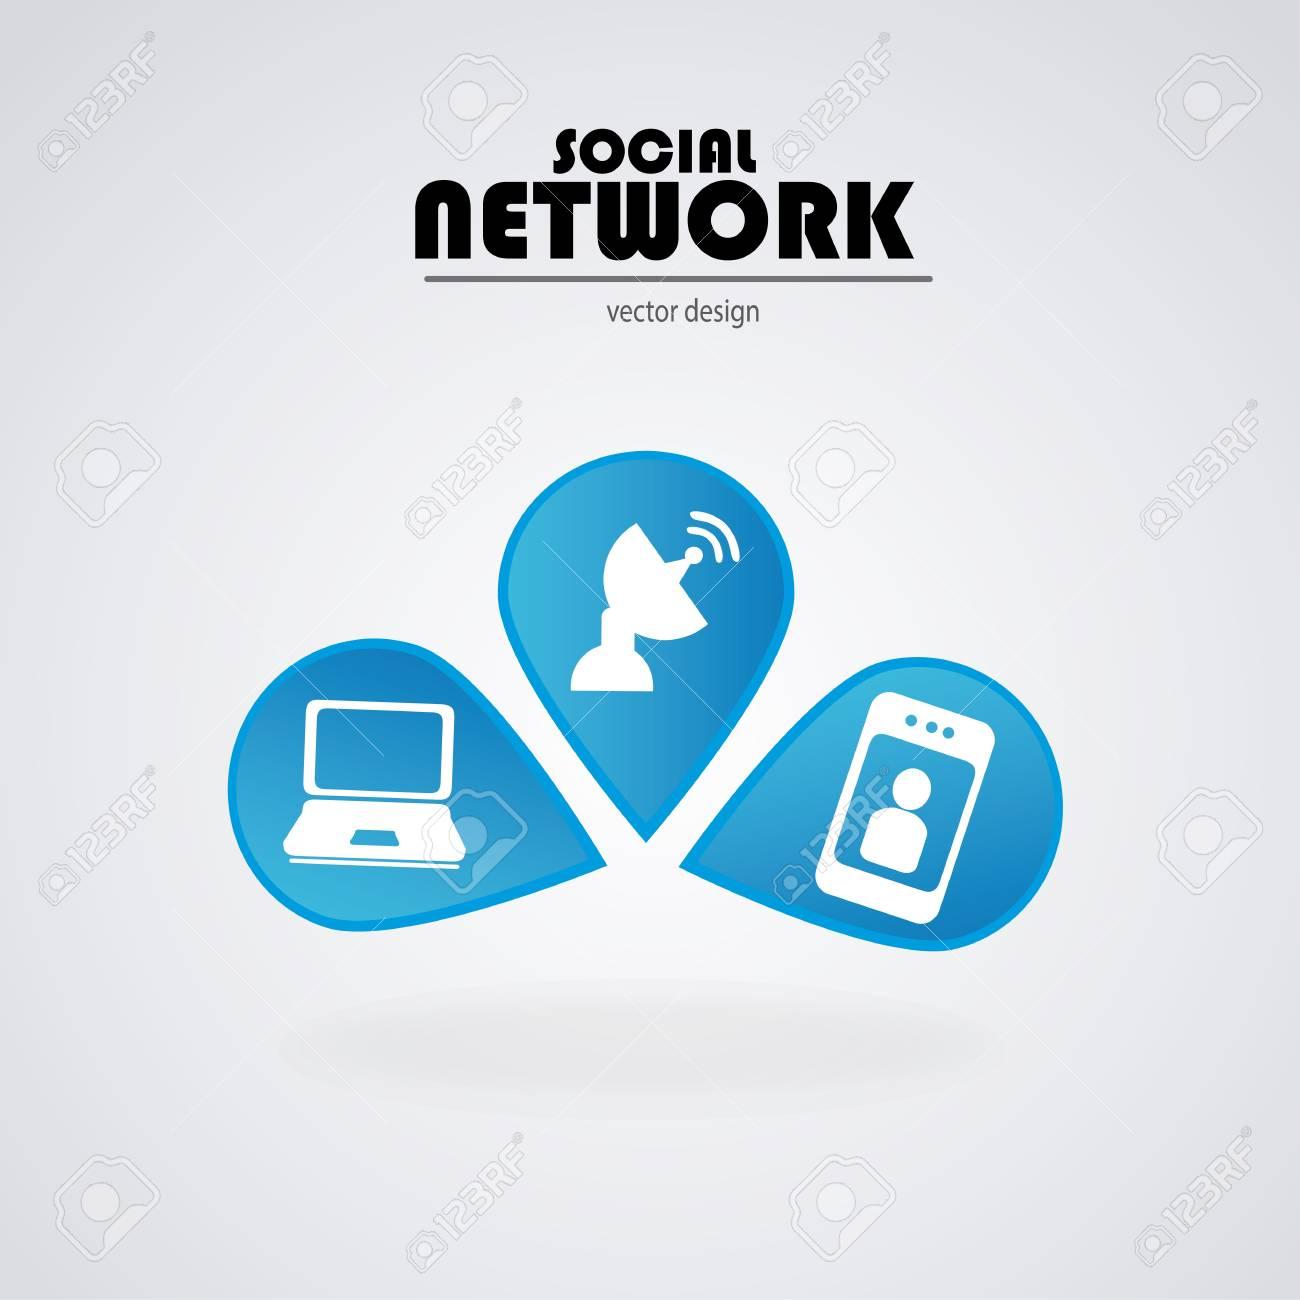 social network bulbs over blue background vector illustration Stock Vector - 19916352